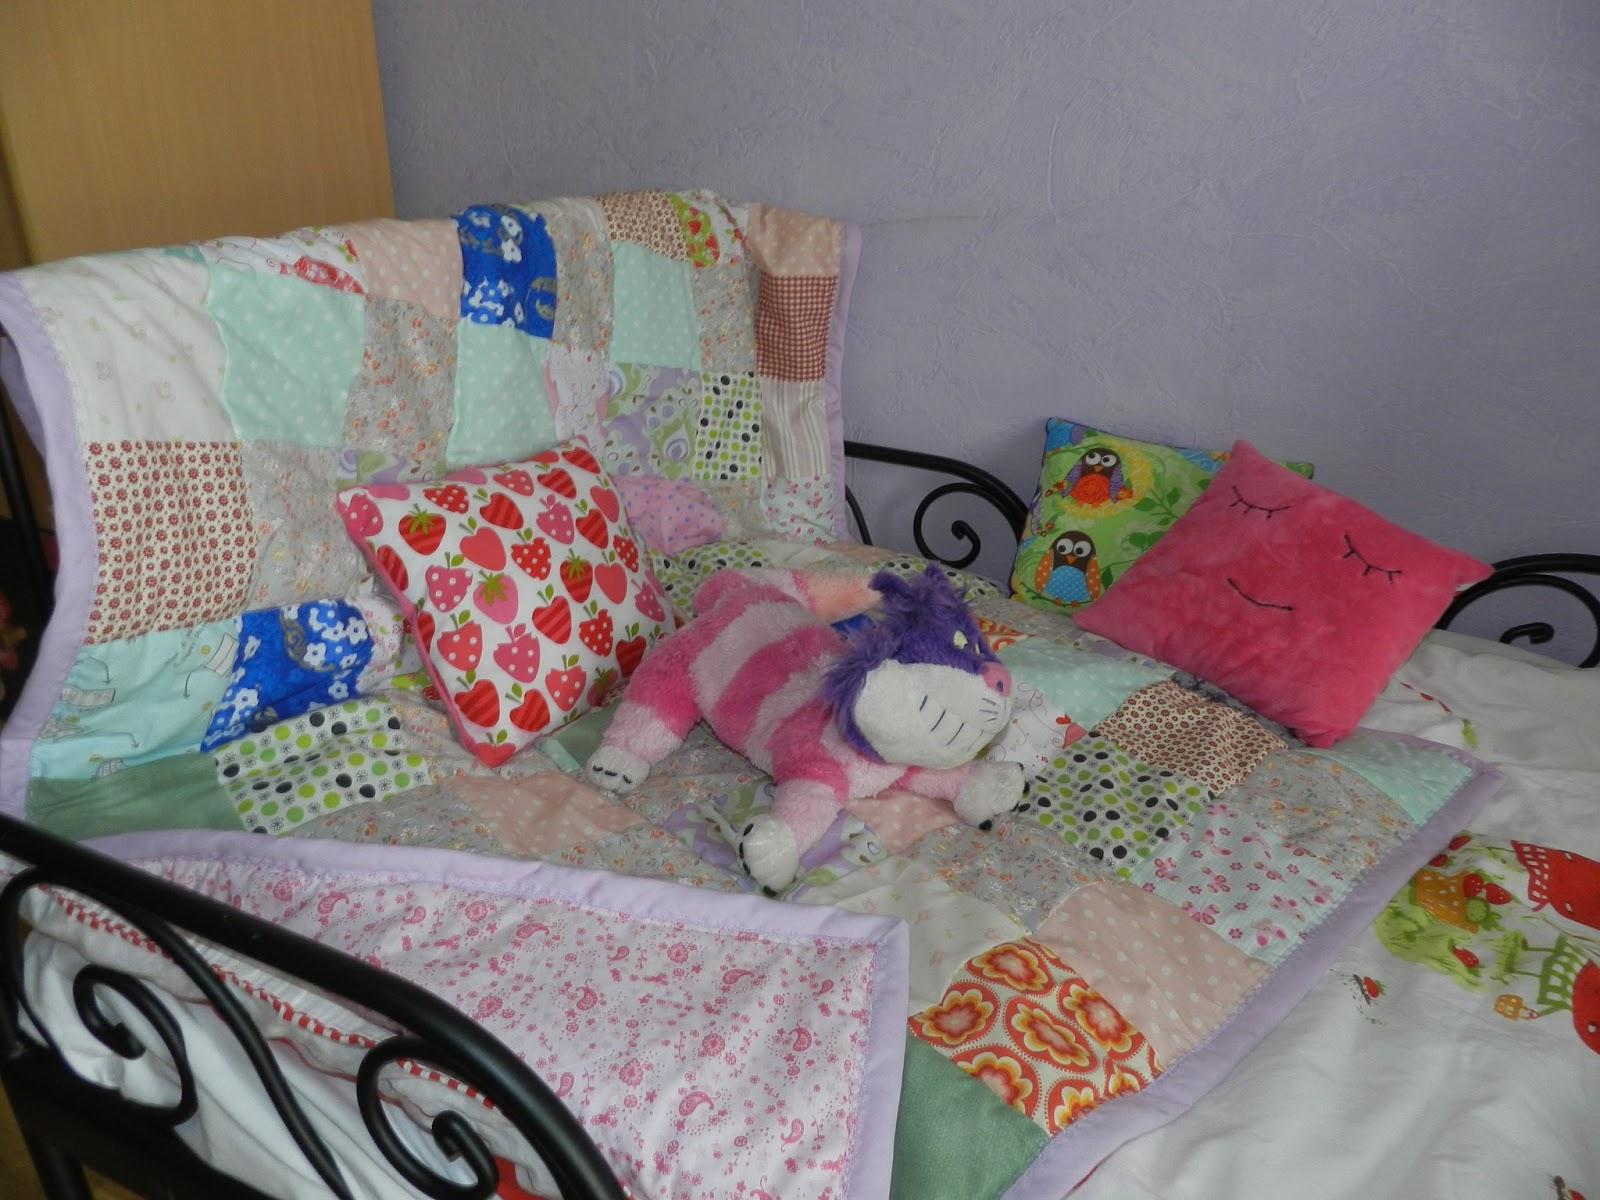 http://4.bp.blogspot.com/-hfeIfOoiB5c/UYanw_8kpKI/AAAAAAAAC5g/1ukqXYj3bPE/s1600/DSCN1310.JPG